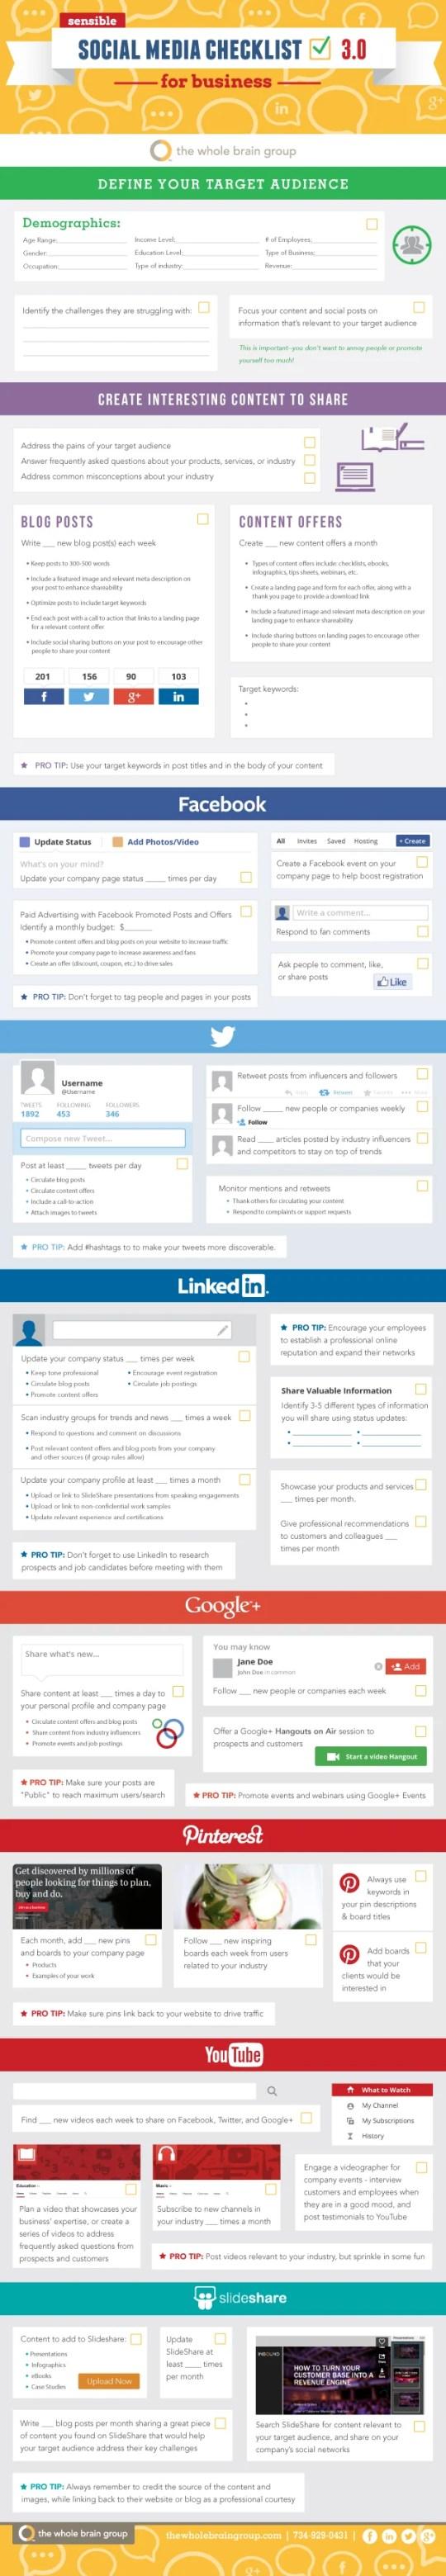 Sensible Social Media Checklist for Business v.3.0 [INFOGRAPHIC]